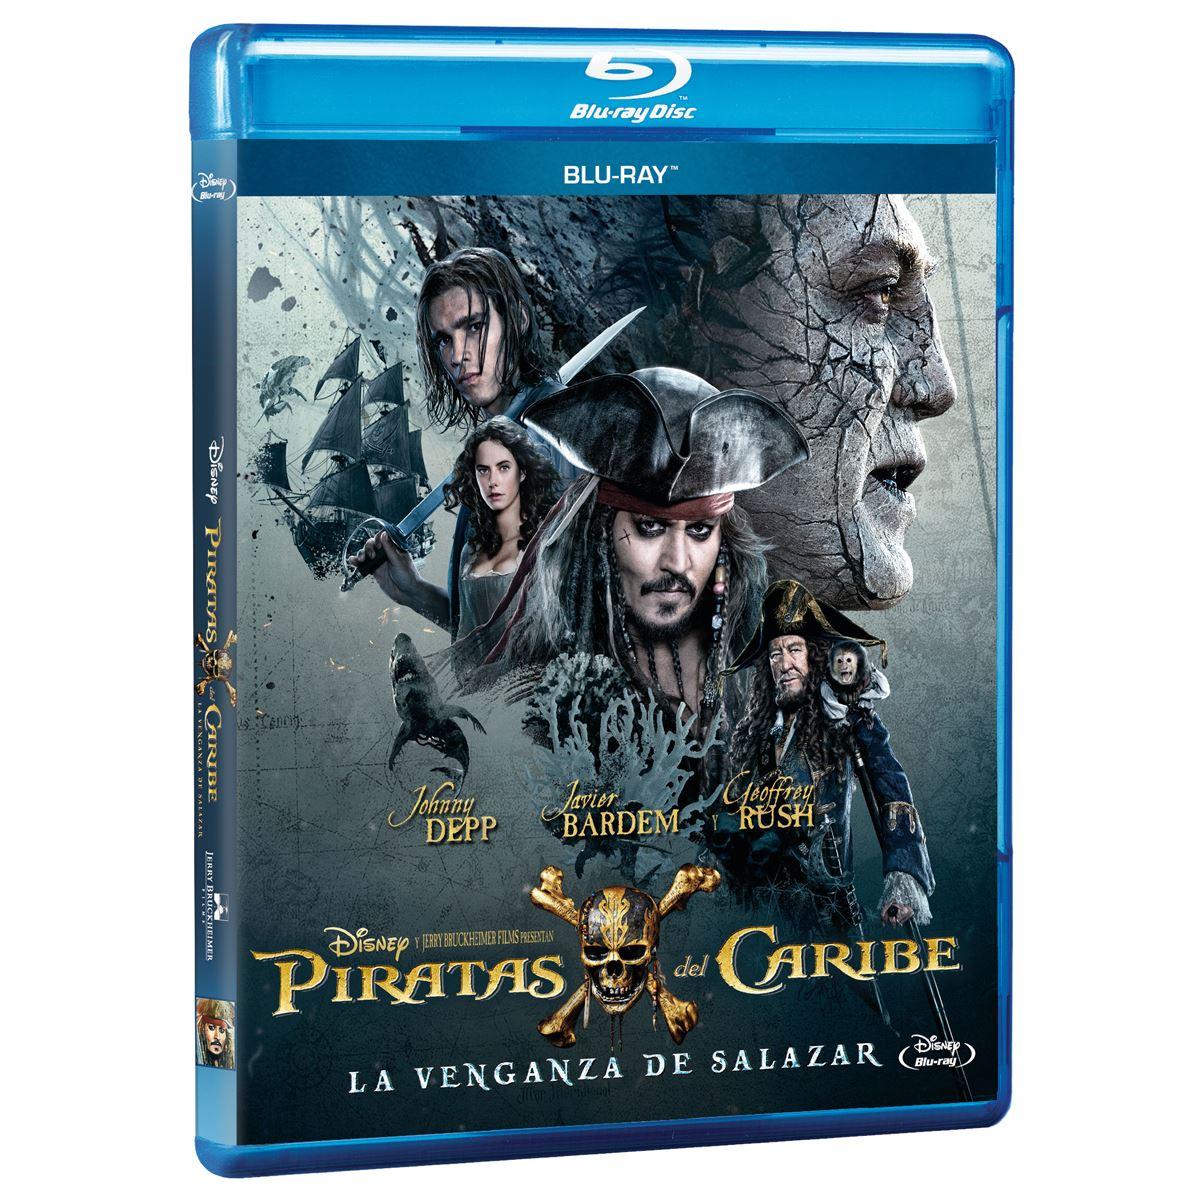 BR Piratas del Caribe 5: La Venganza de Salazar